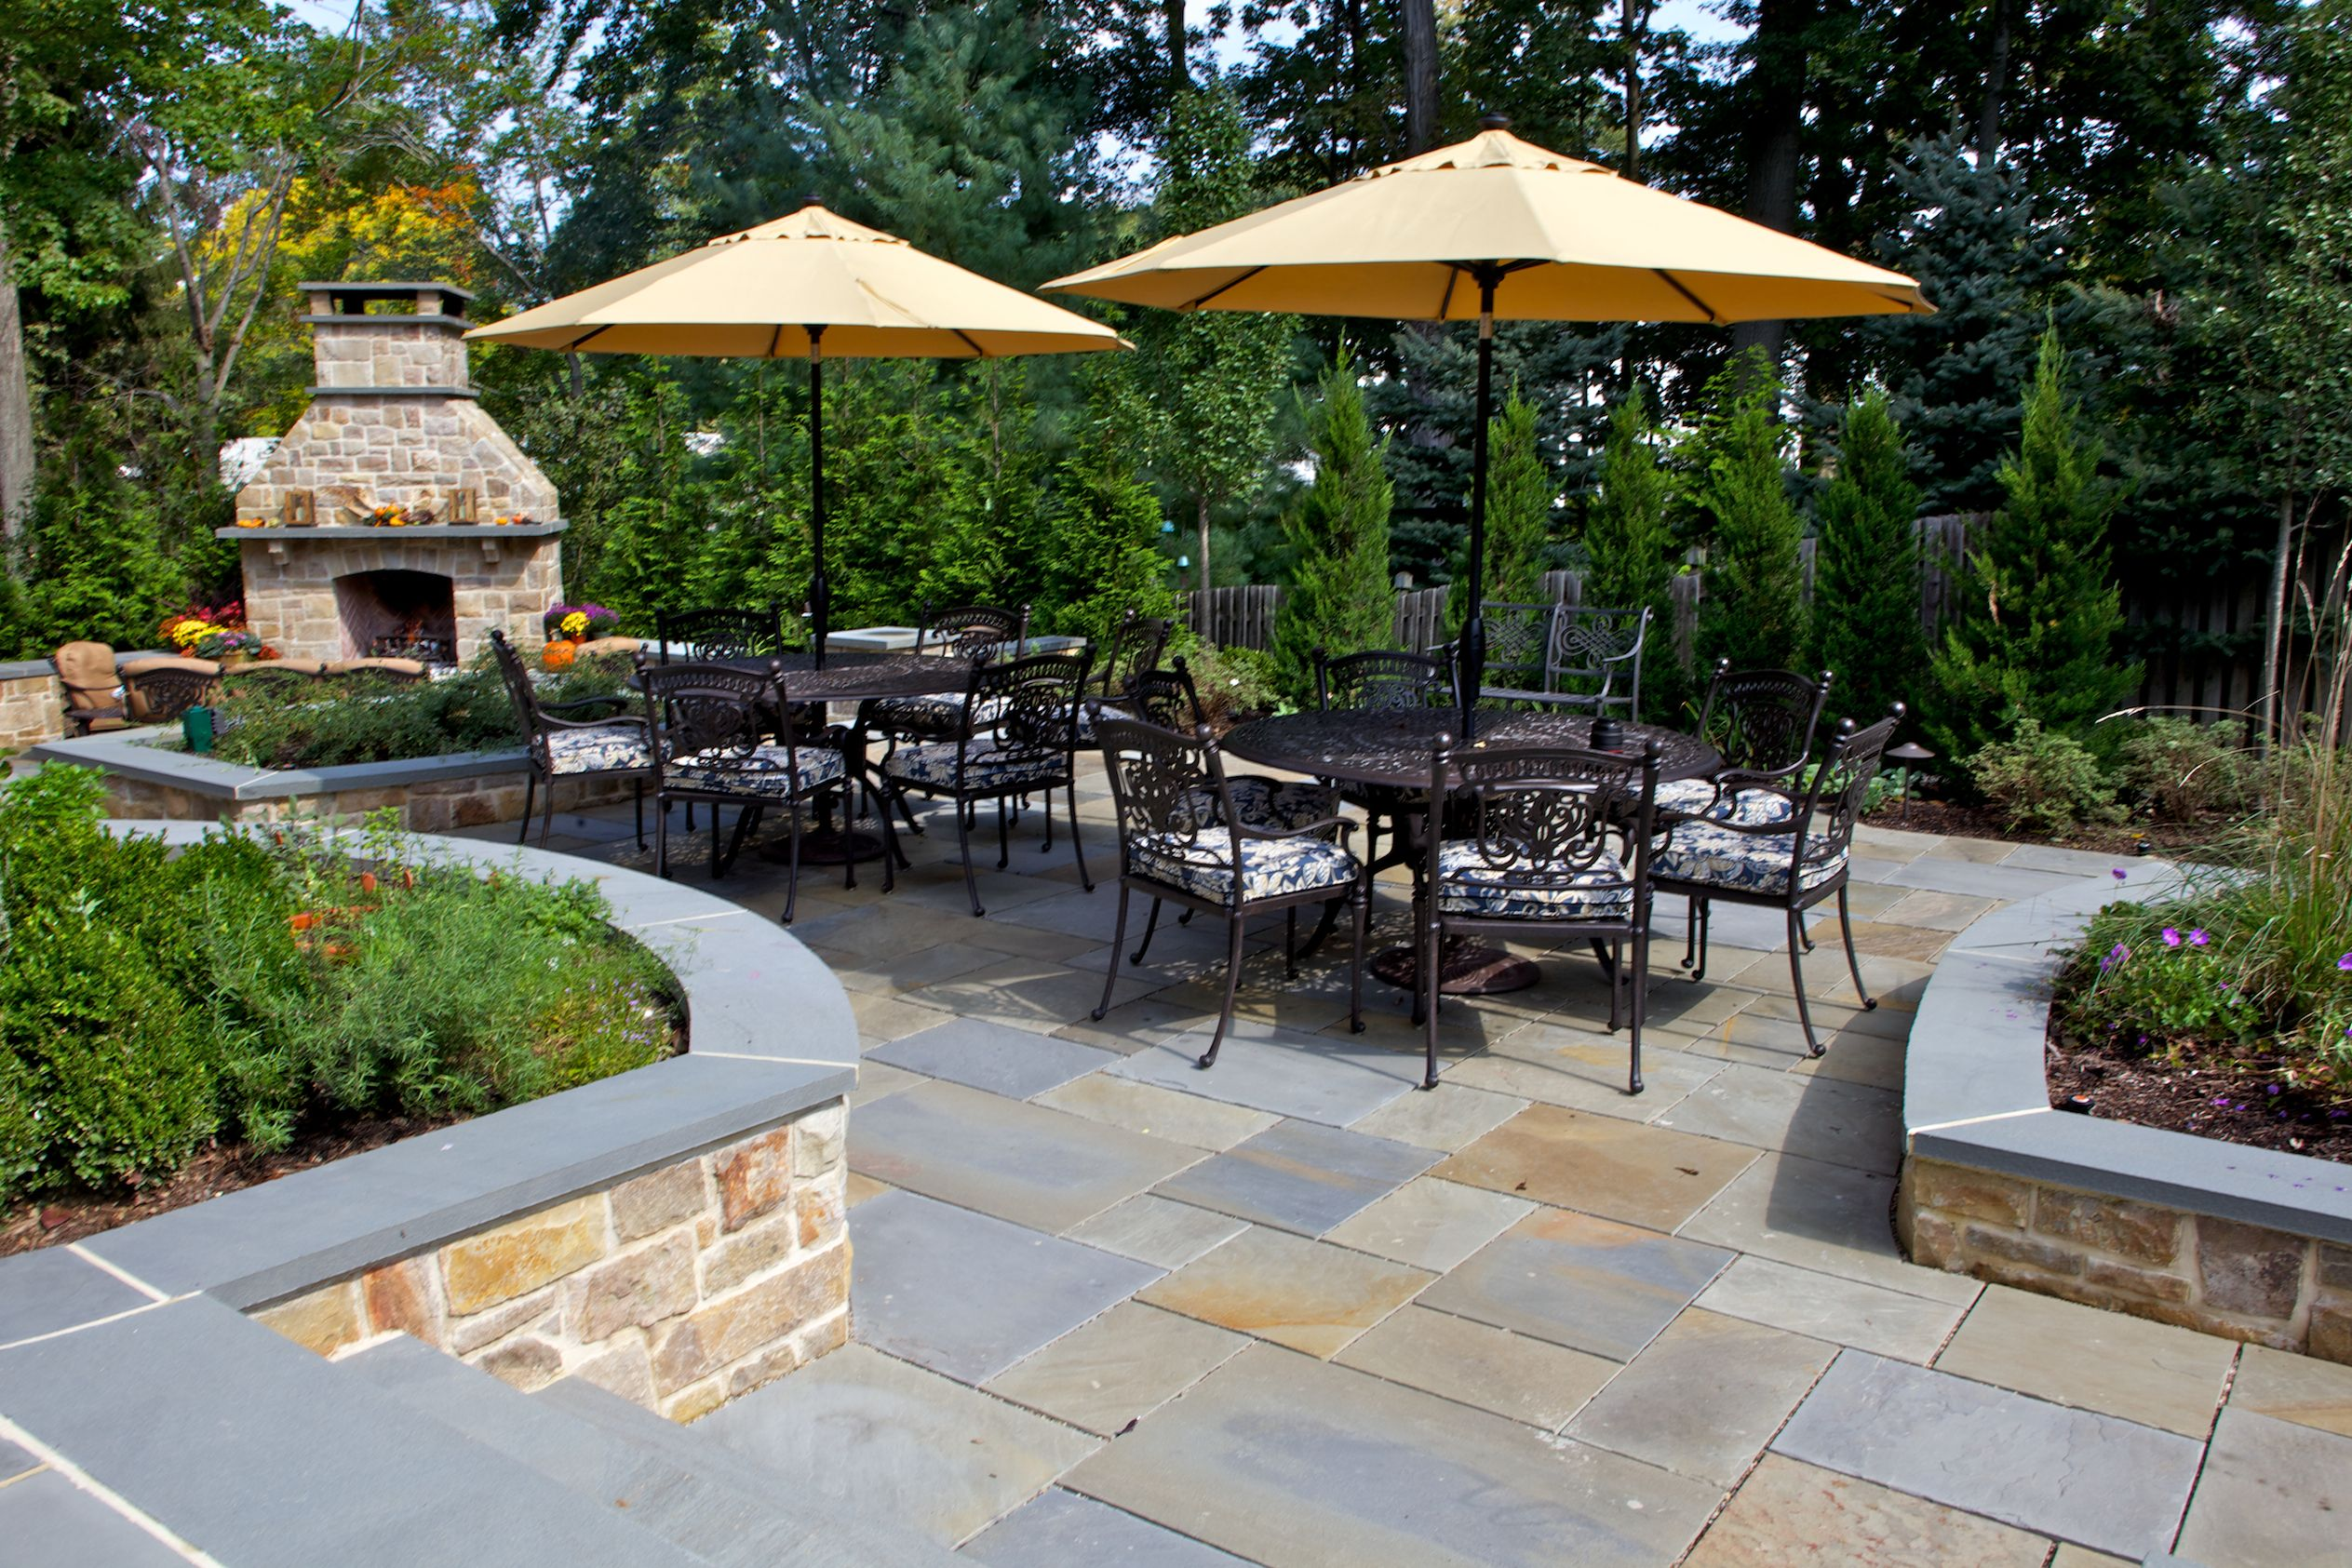 patio designs | patio-design-ideas-2527x1685-patio-nj-nj